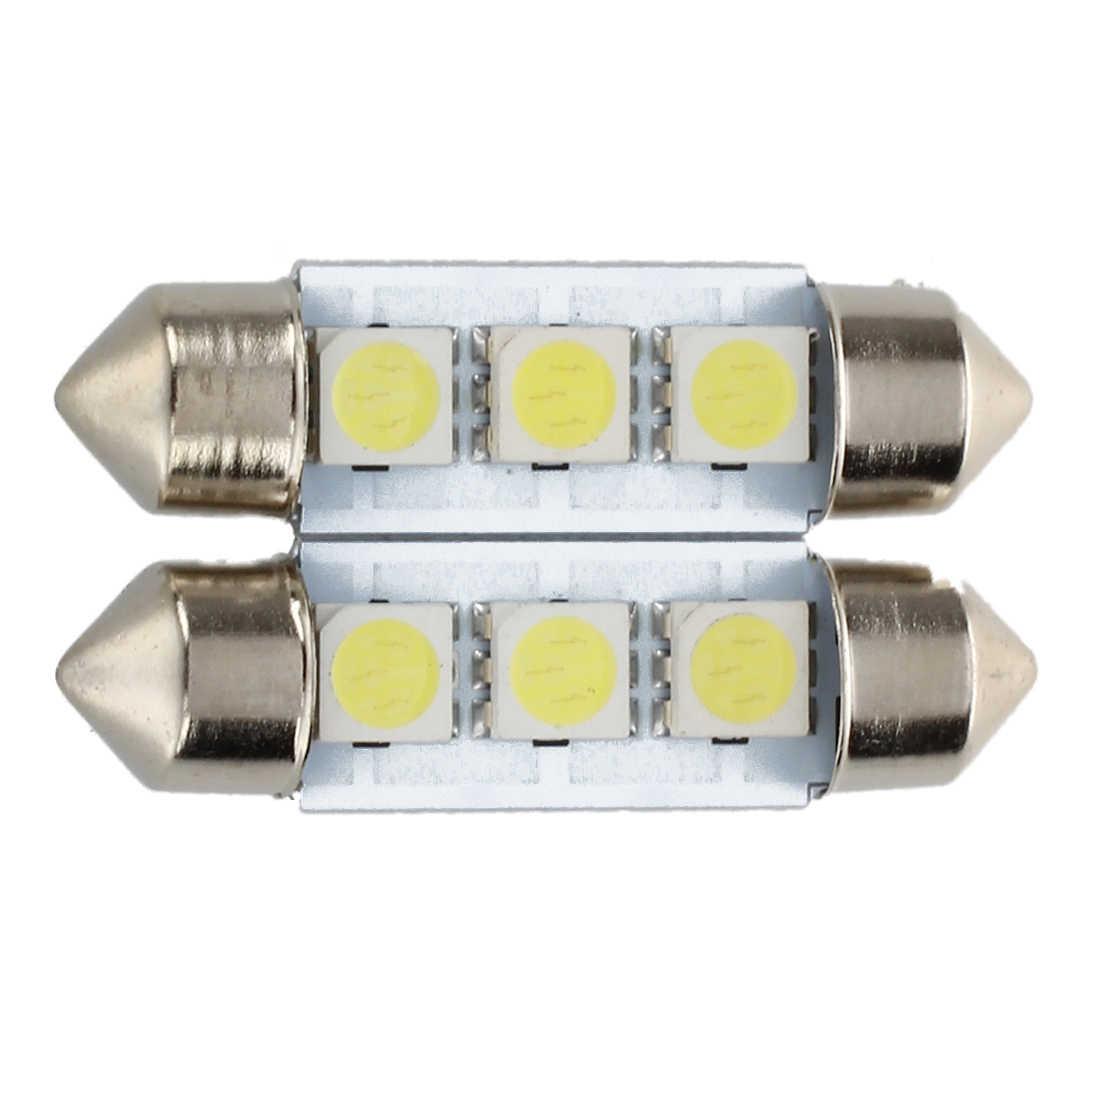 New-2x C5W 3 SMD 5050 LED 36 Mm Xenon Putih Lampu Plat Antar-jemput Festoon Dome Langit-langit Lampu Mobil